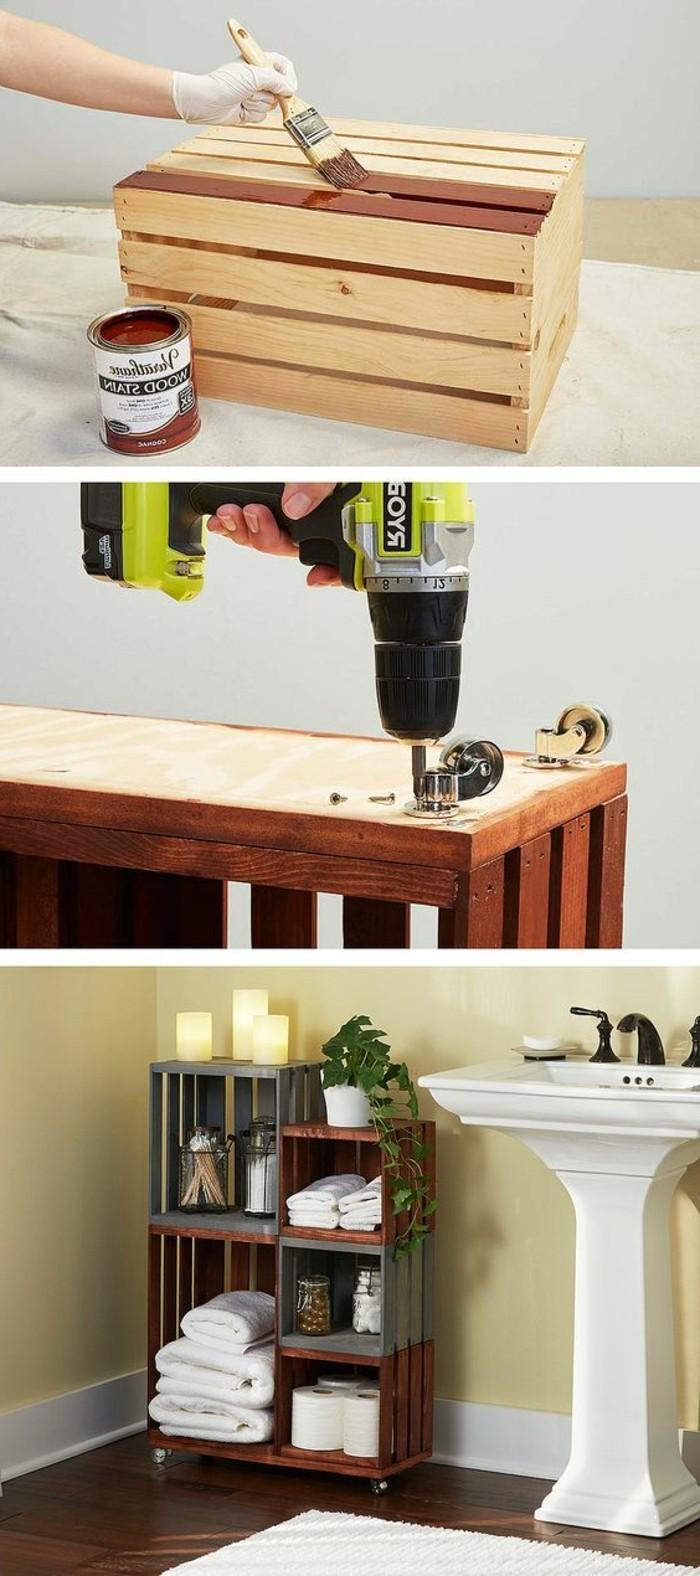 1001 ideas para hacer muebles con palets f ciles. Black Bedroom Furniture Sets. Home Design Ideas